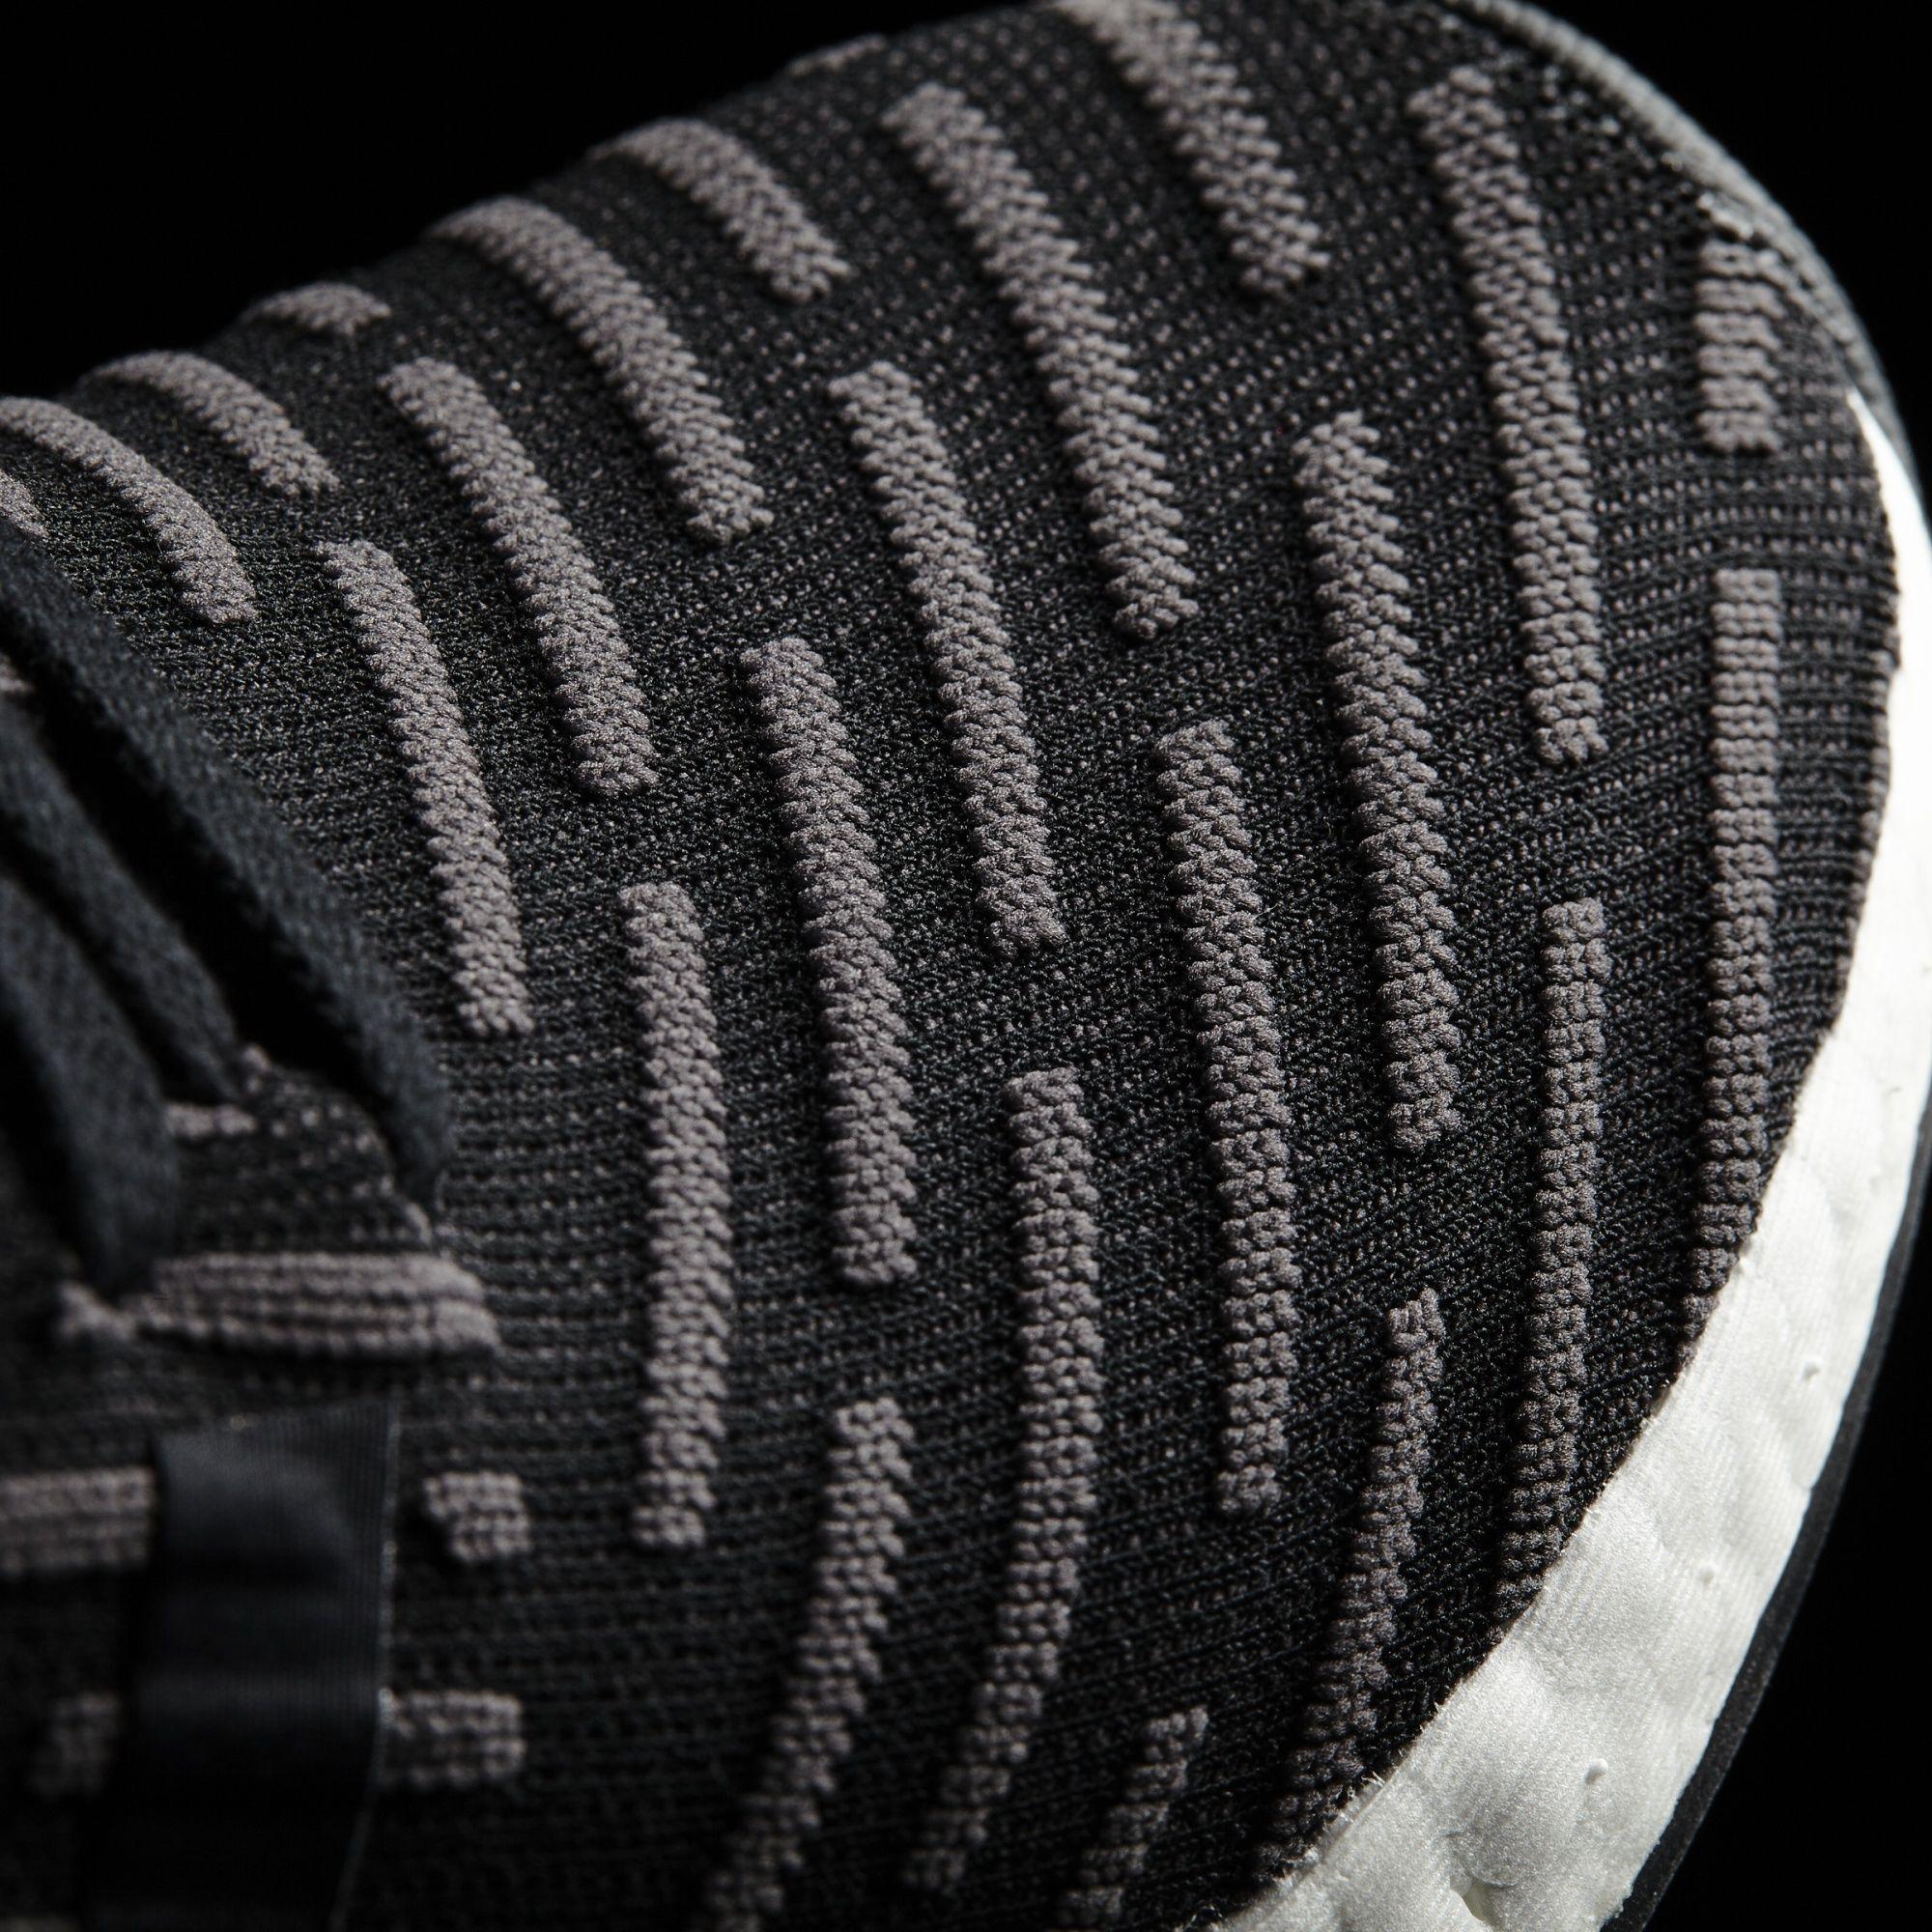 adidas NMD_R2 Primeknit Black Primeknit BA7239